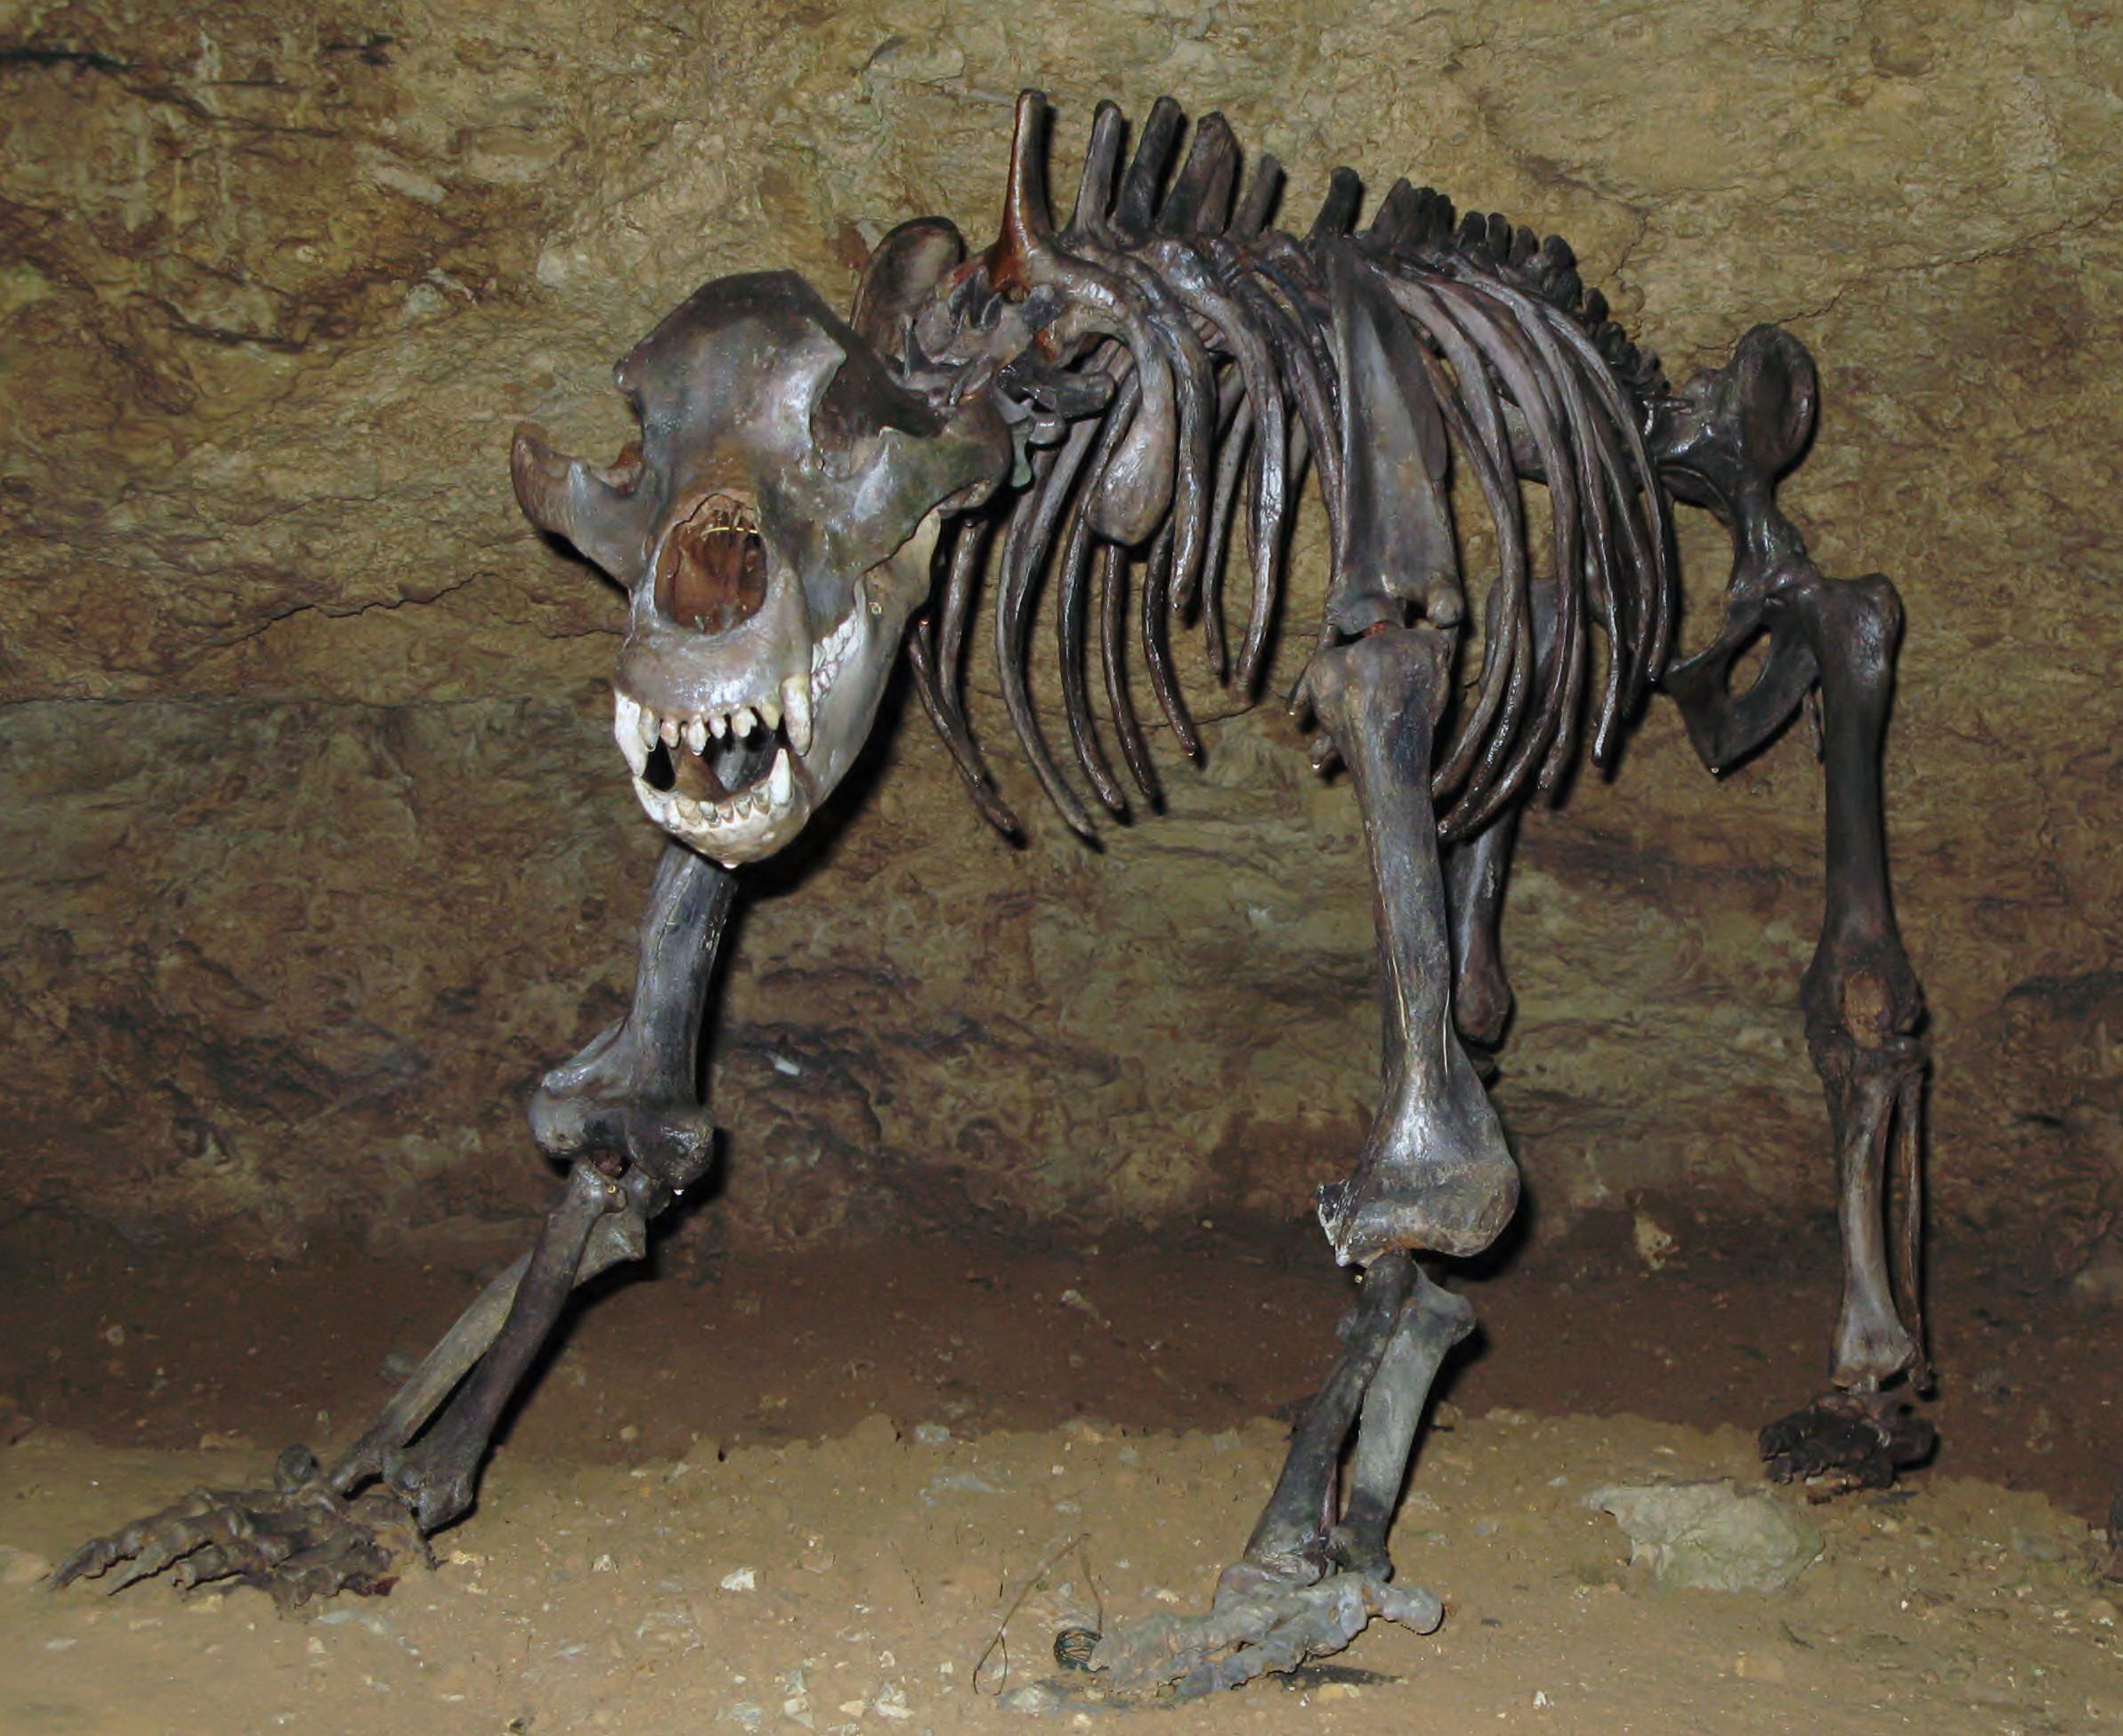 Teufelsh%C3%B6hle H%C3%B6hlenb%C3%A4r Dreiviertelprofil cave bear wikipedia